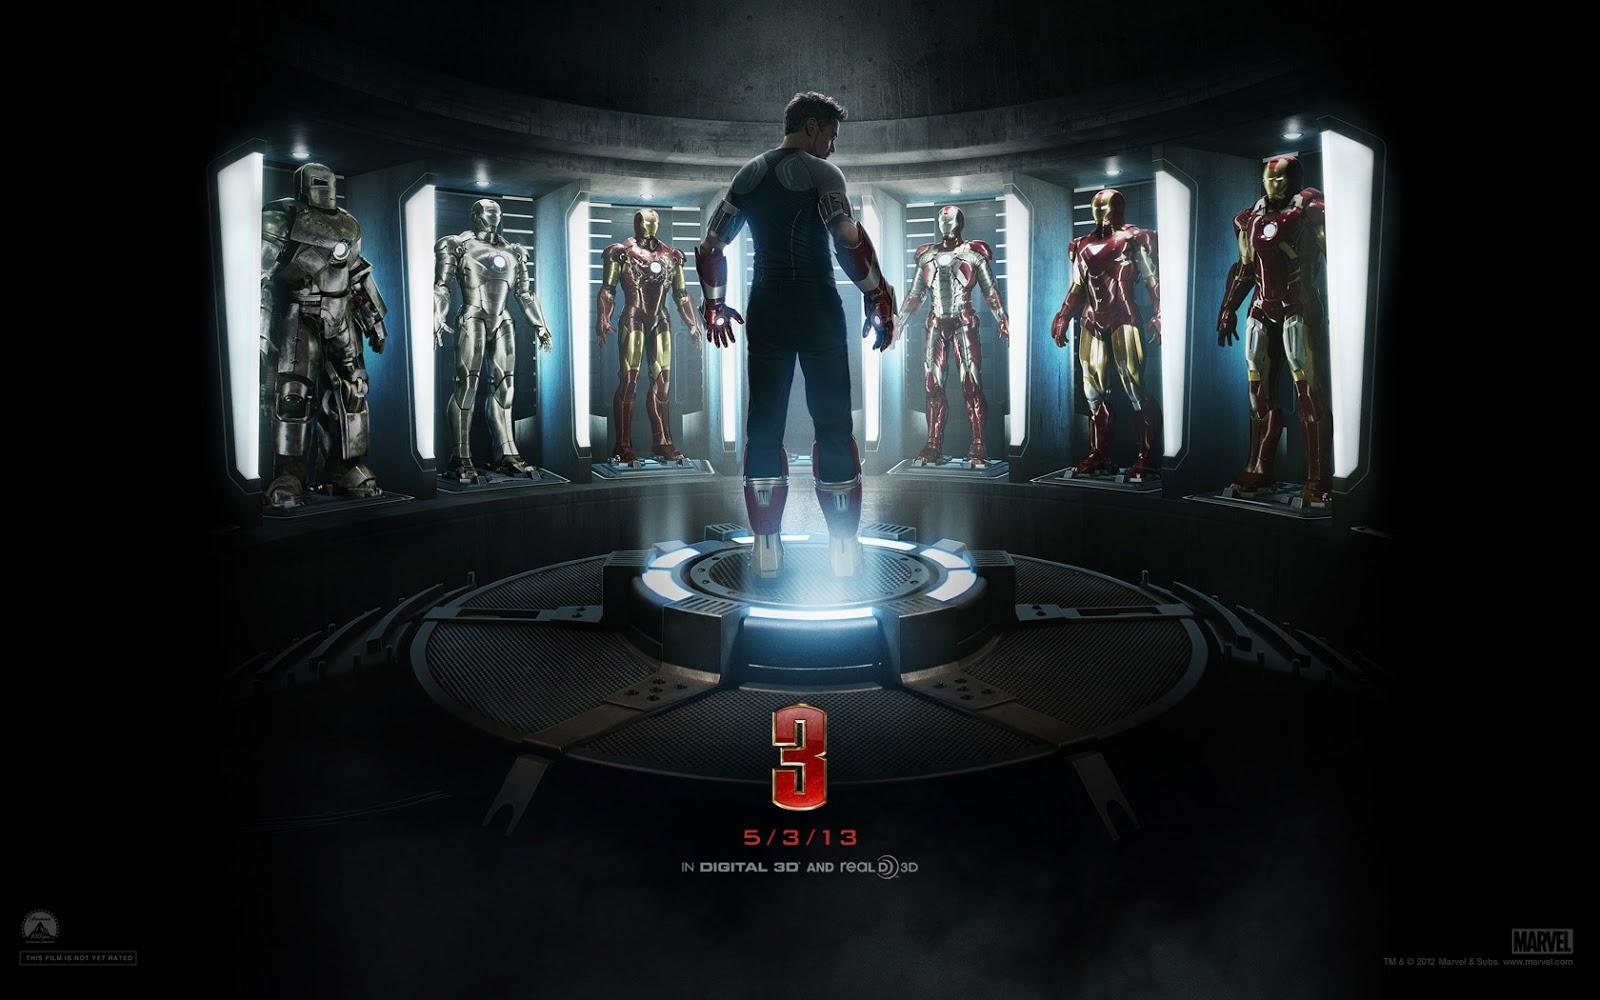 iron man 3 hd desktop wallpapers free download | top level beautiful